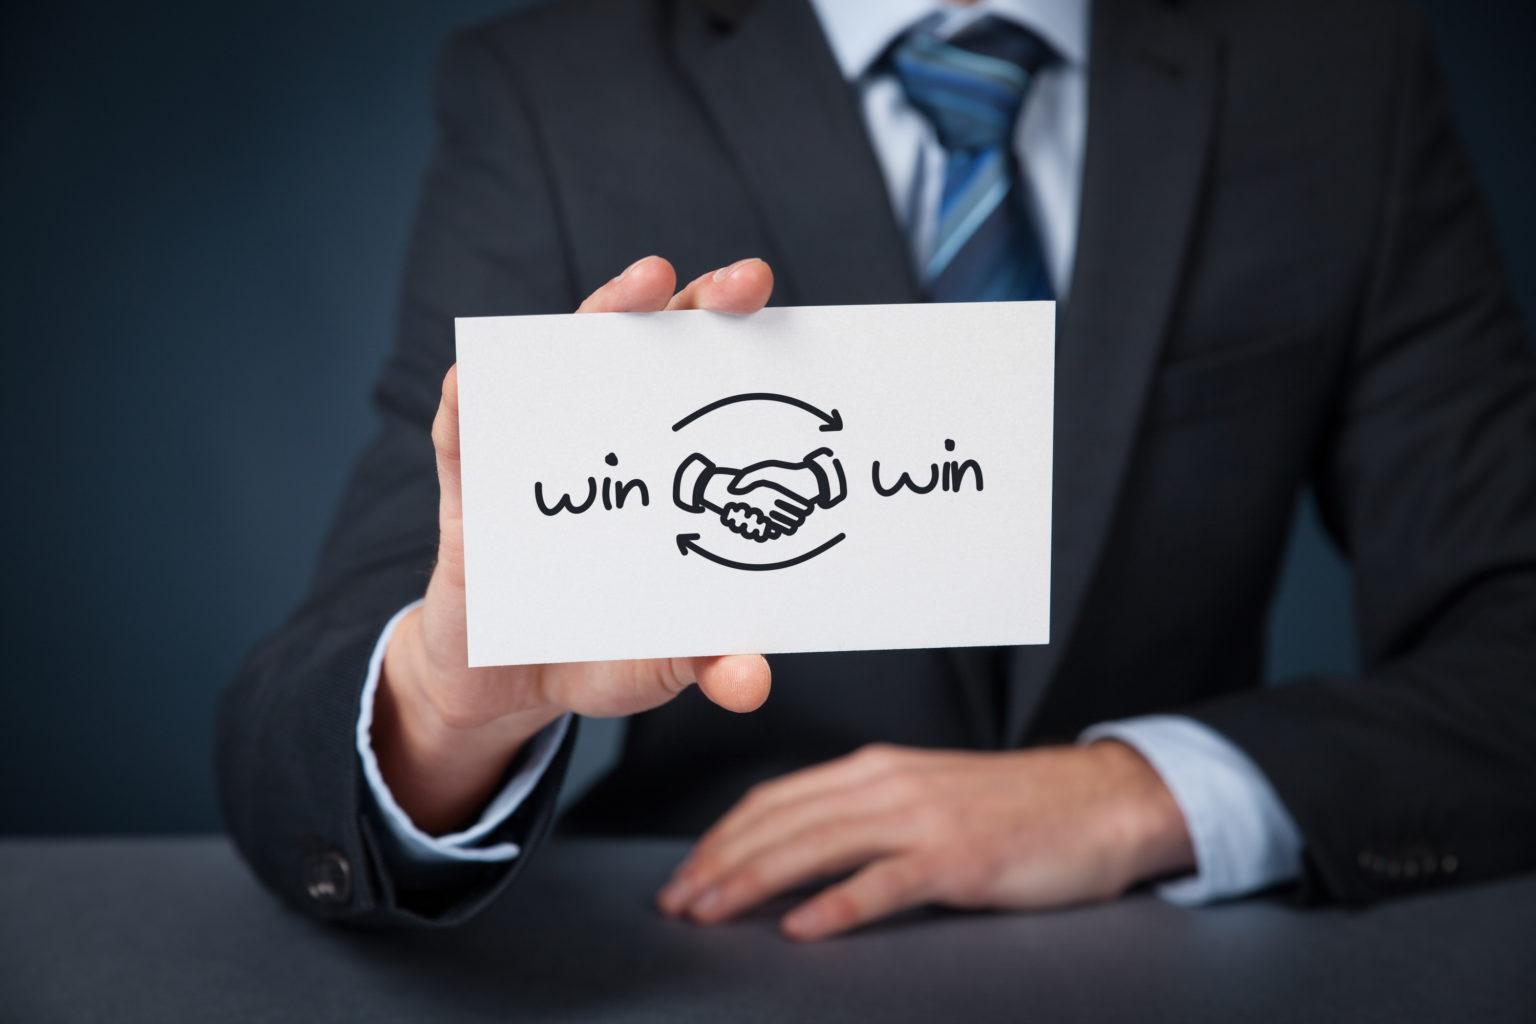 win-win onderhandelen, wat is dat?